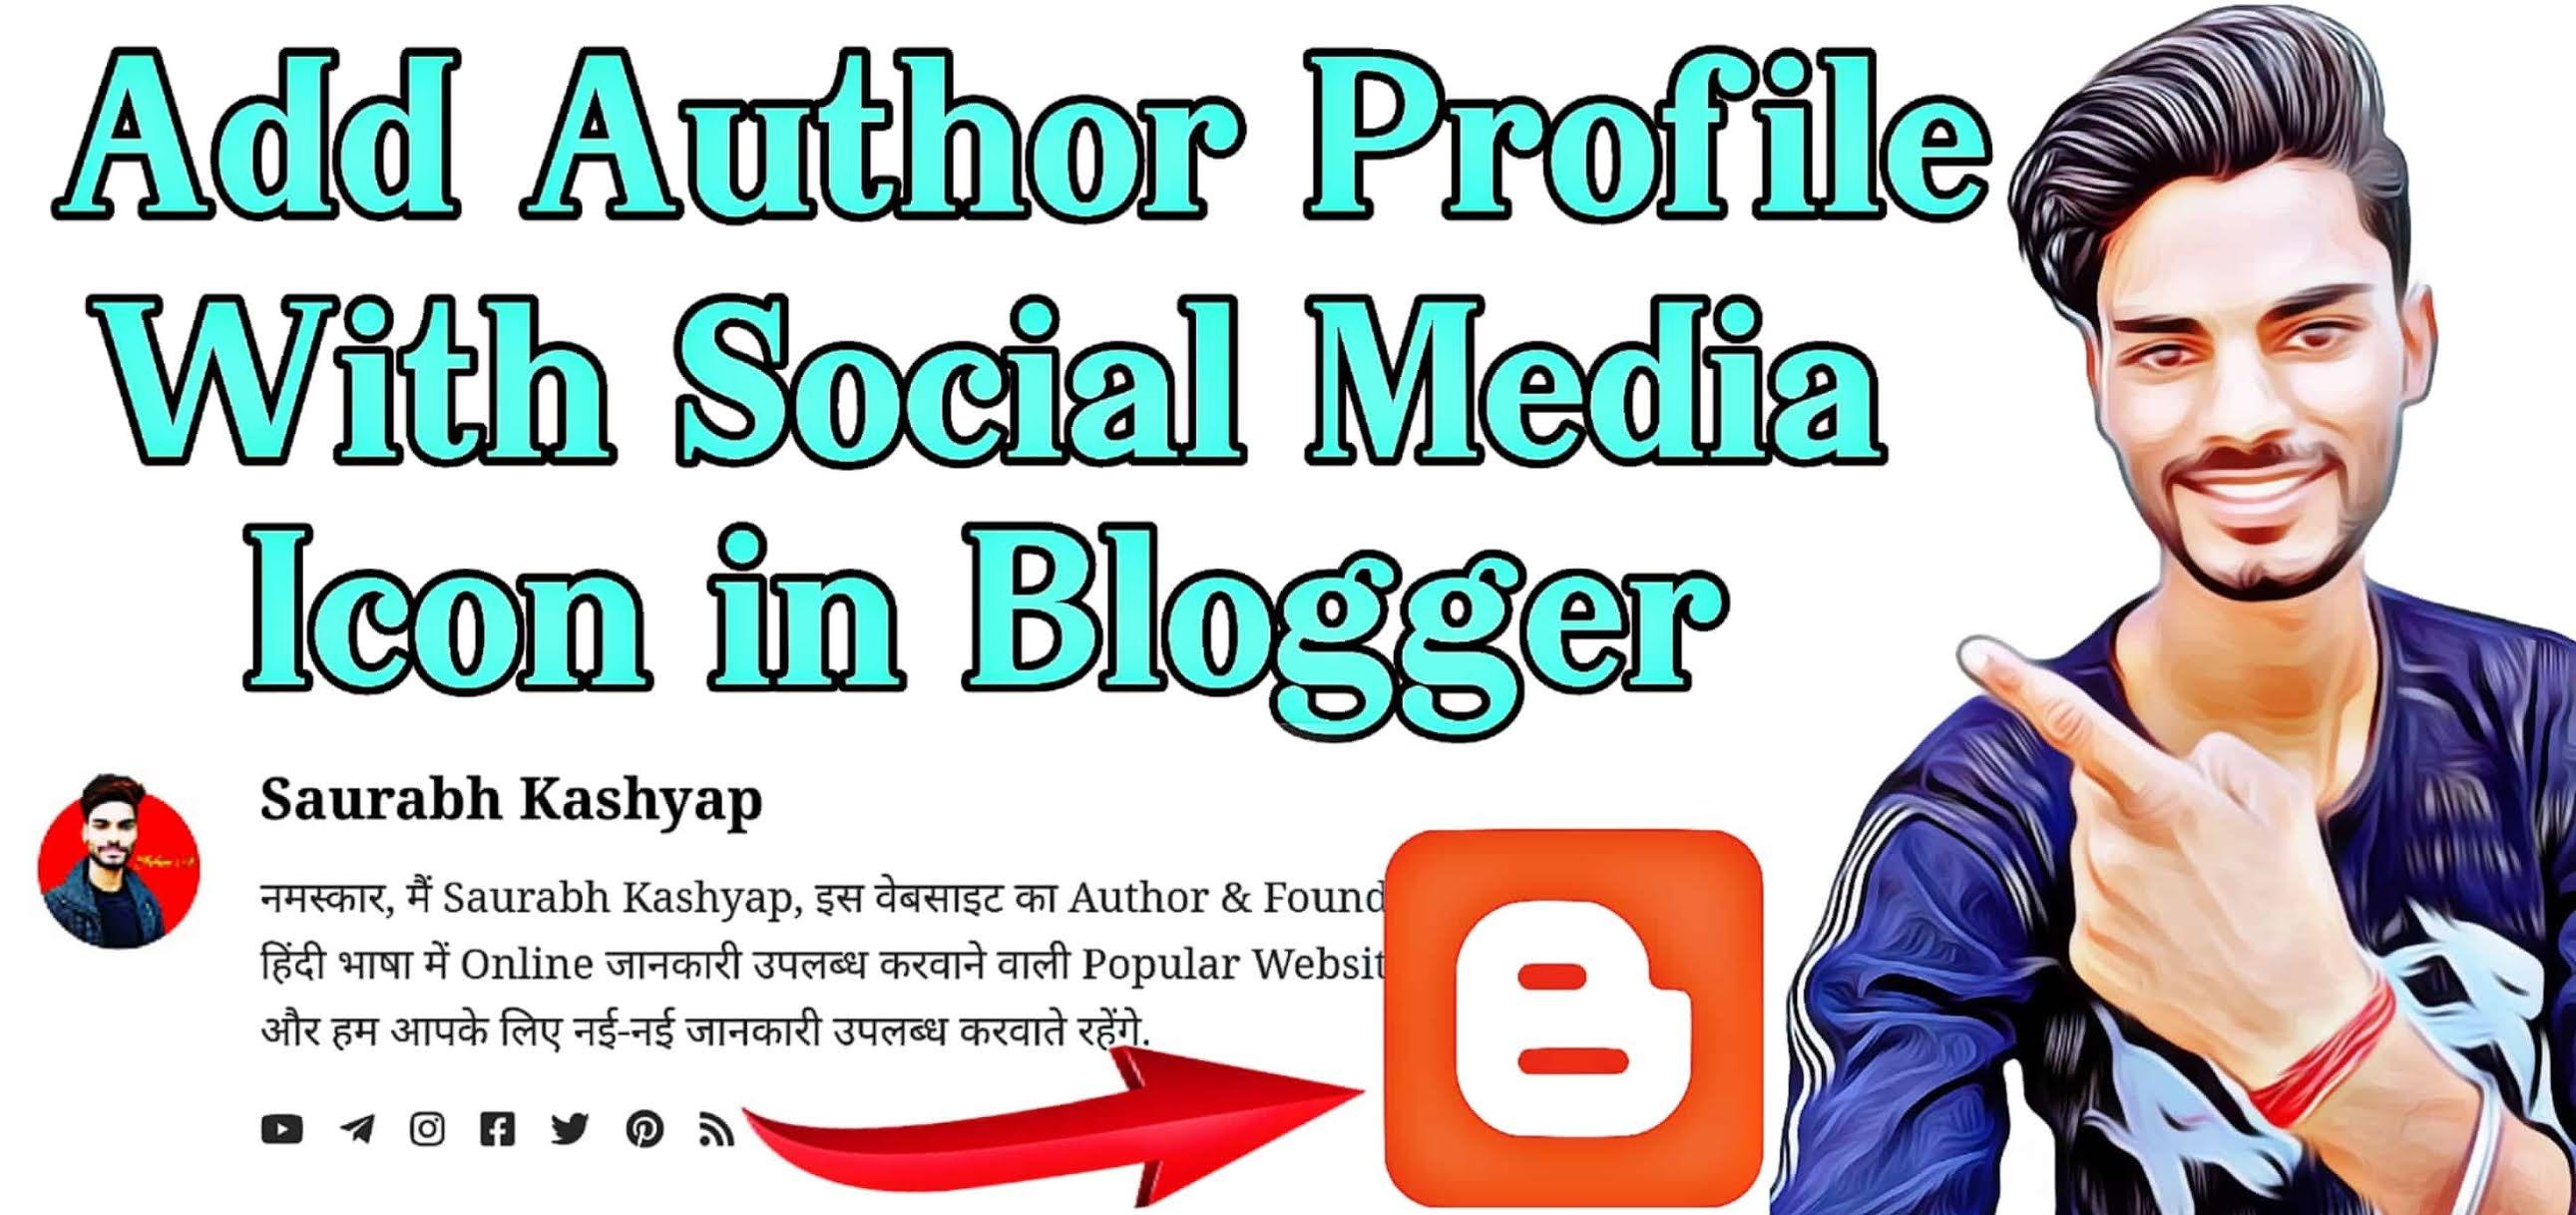 Blogger Blog/Website के Author Profile में Social Media Account कैसे Add करें 2021